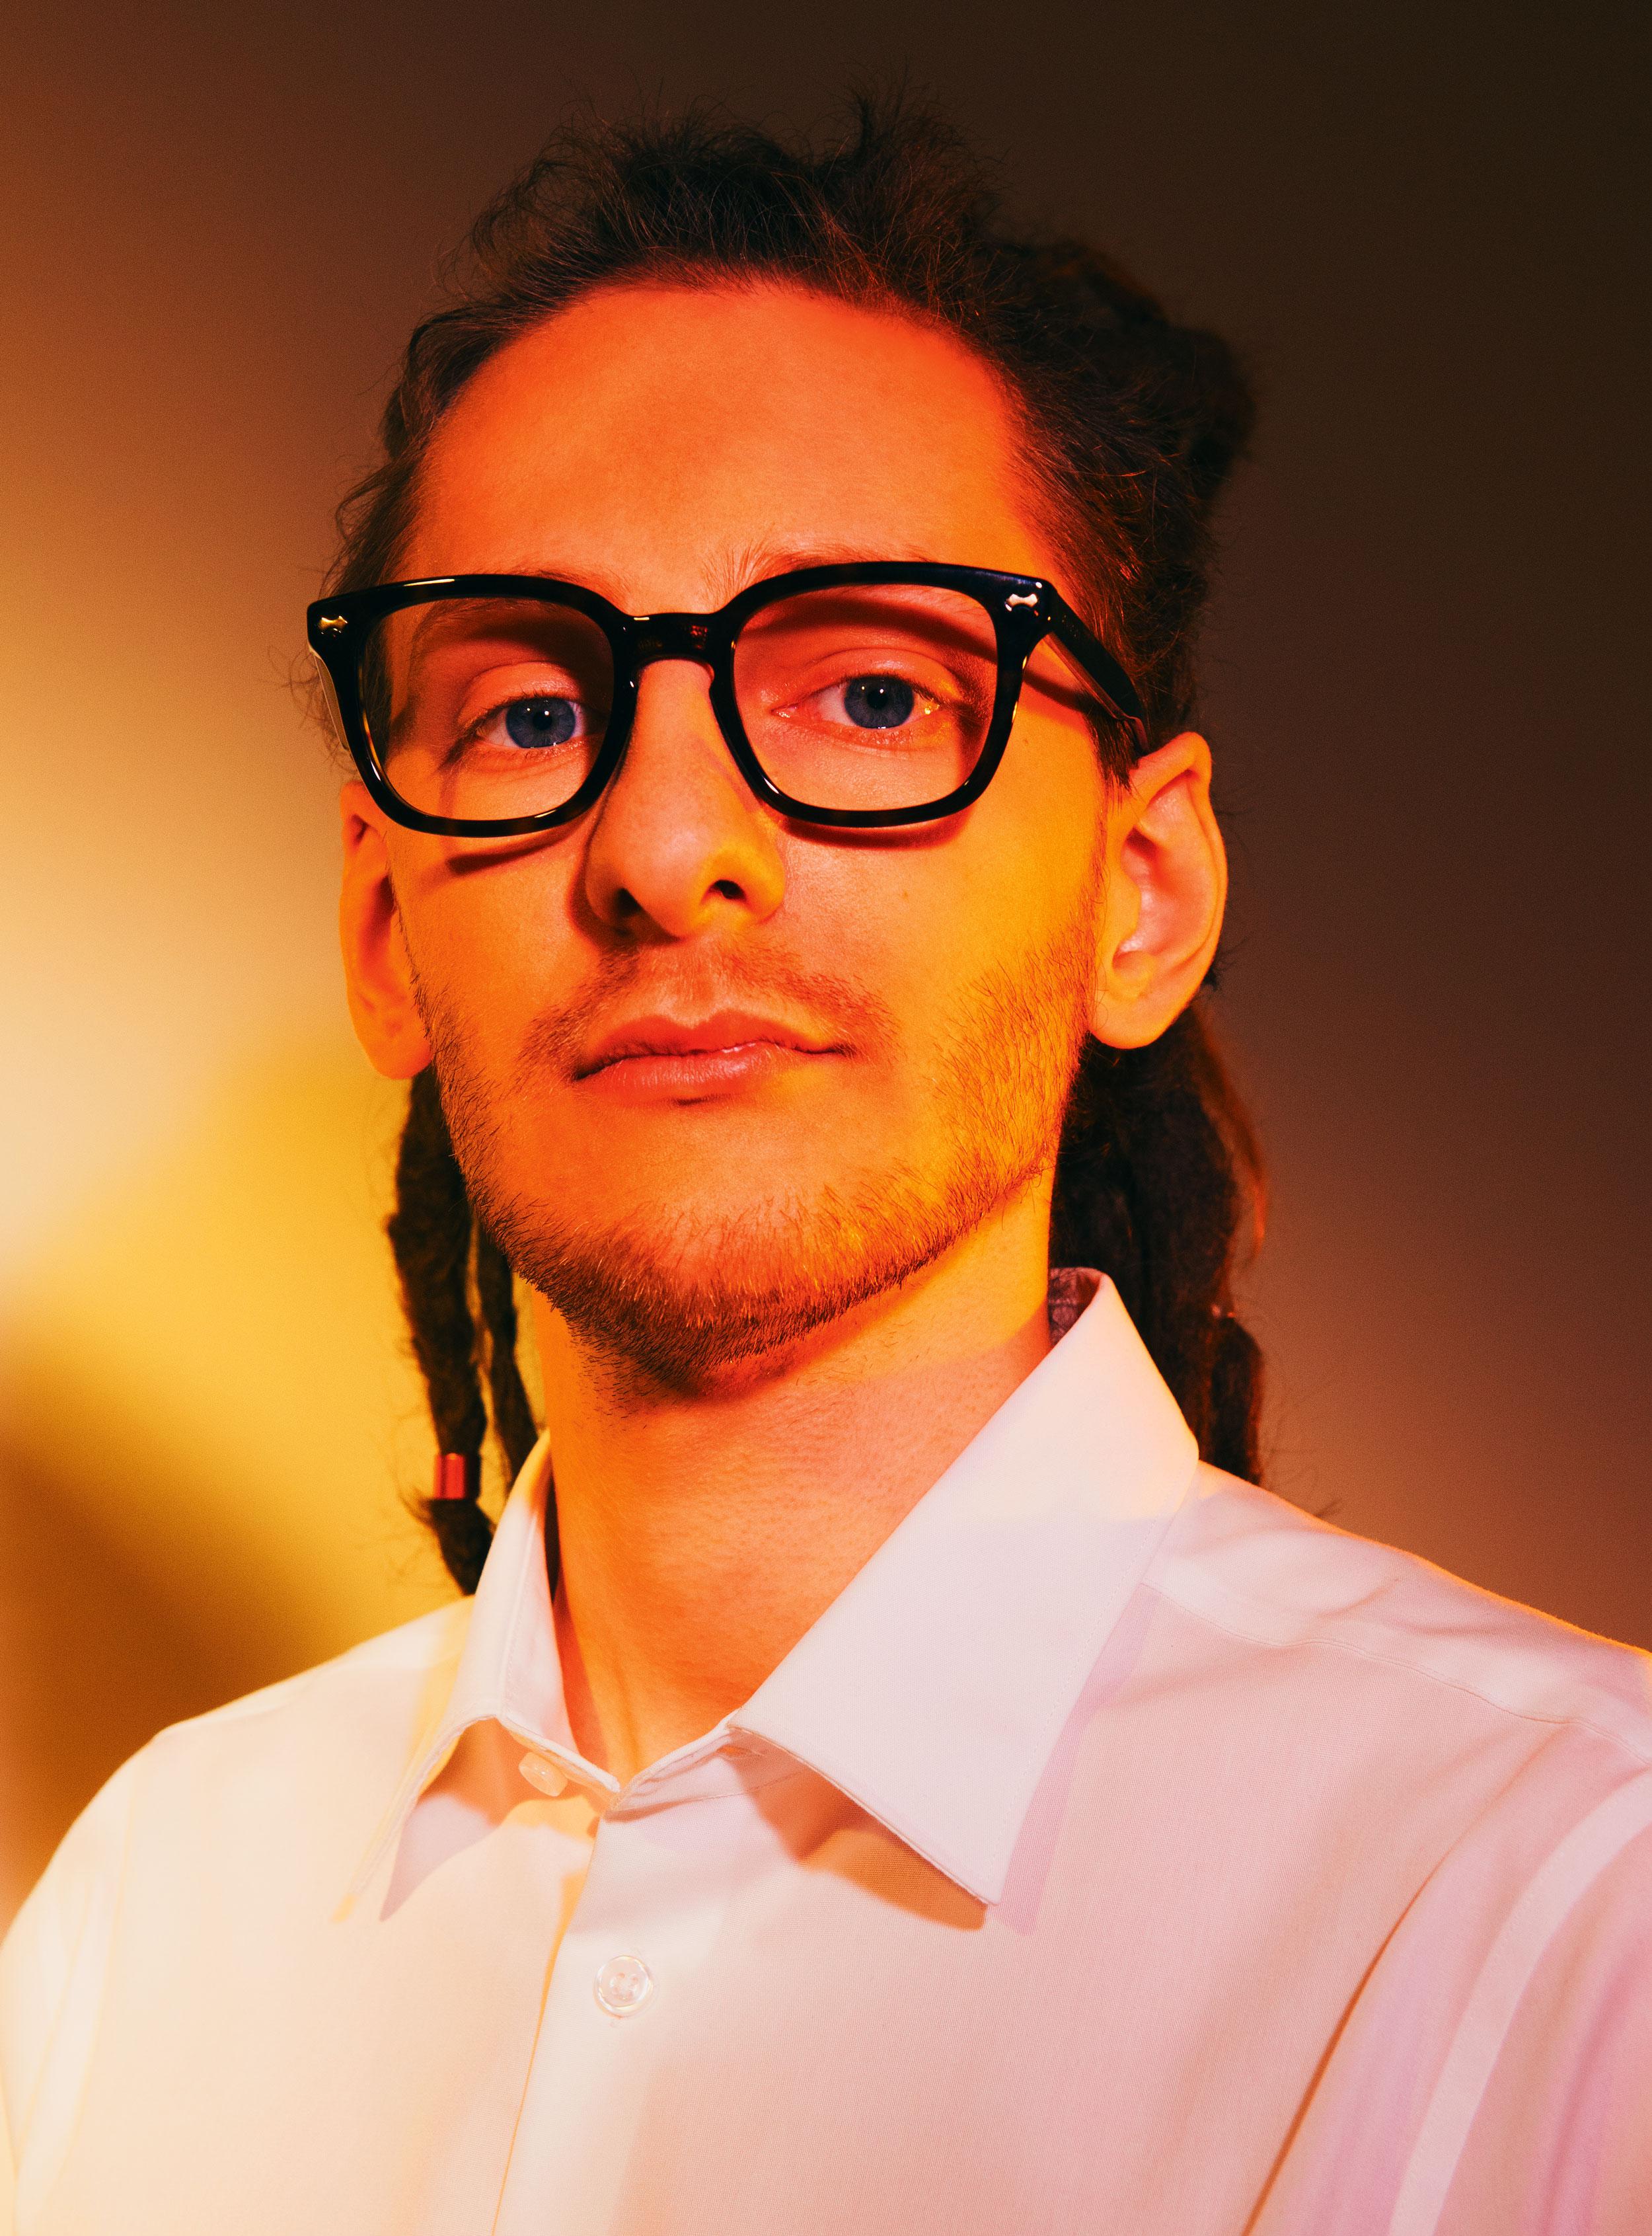 Майка ирубашка Henderson, очки Gucci